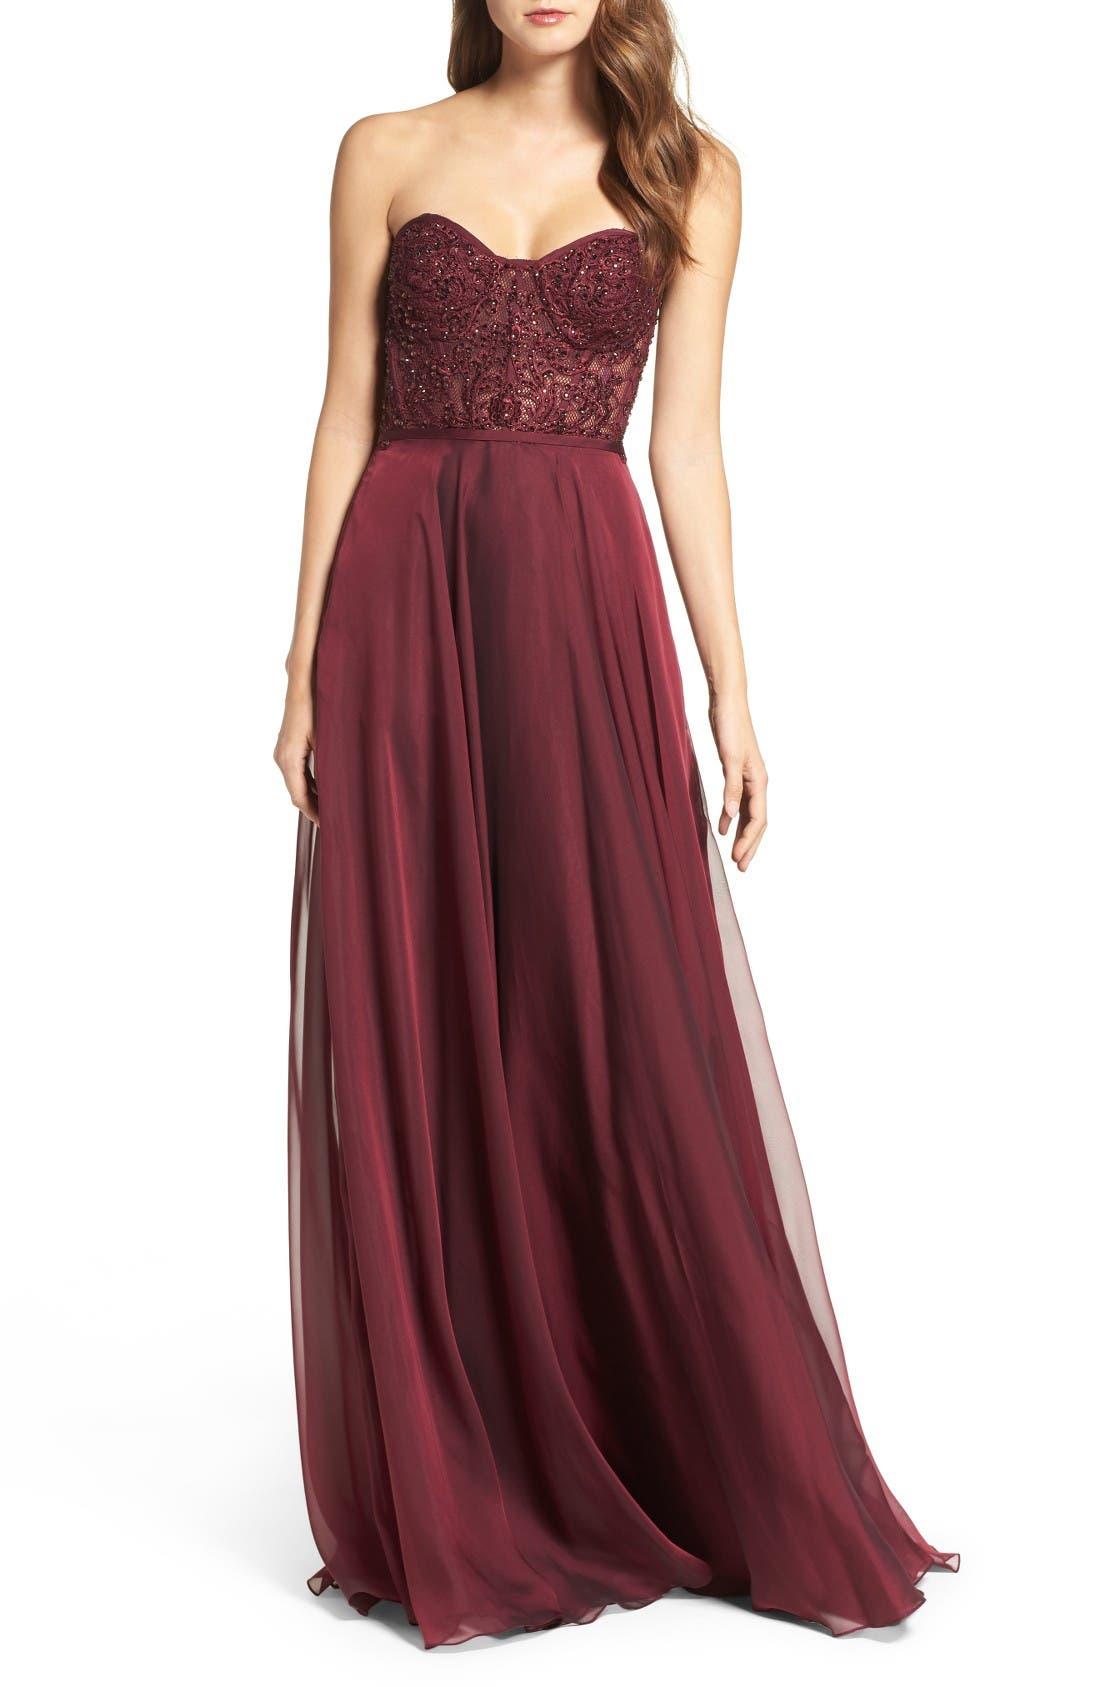 Main Image - La Femme Embellished Strapless Gown